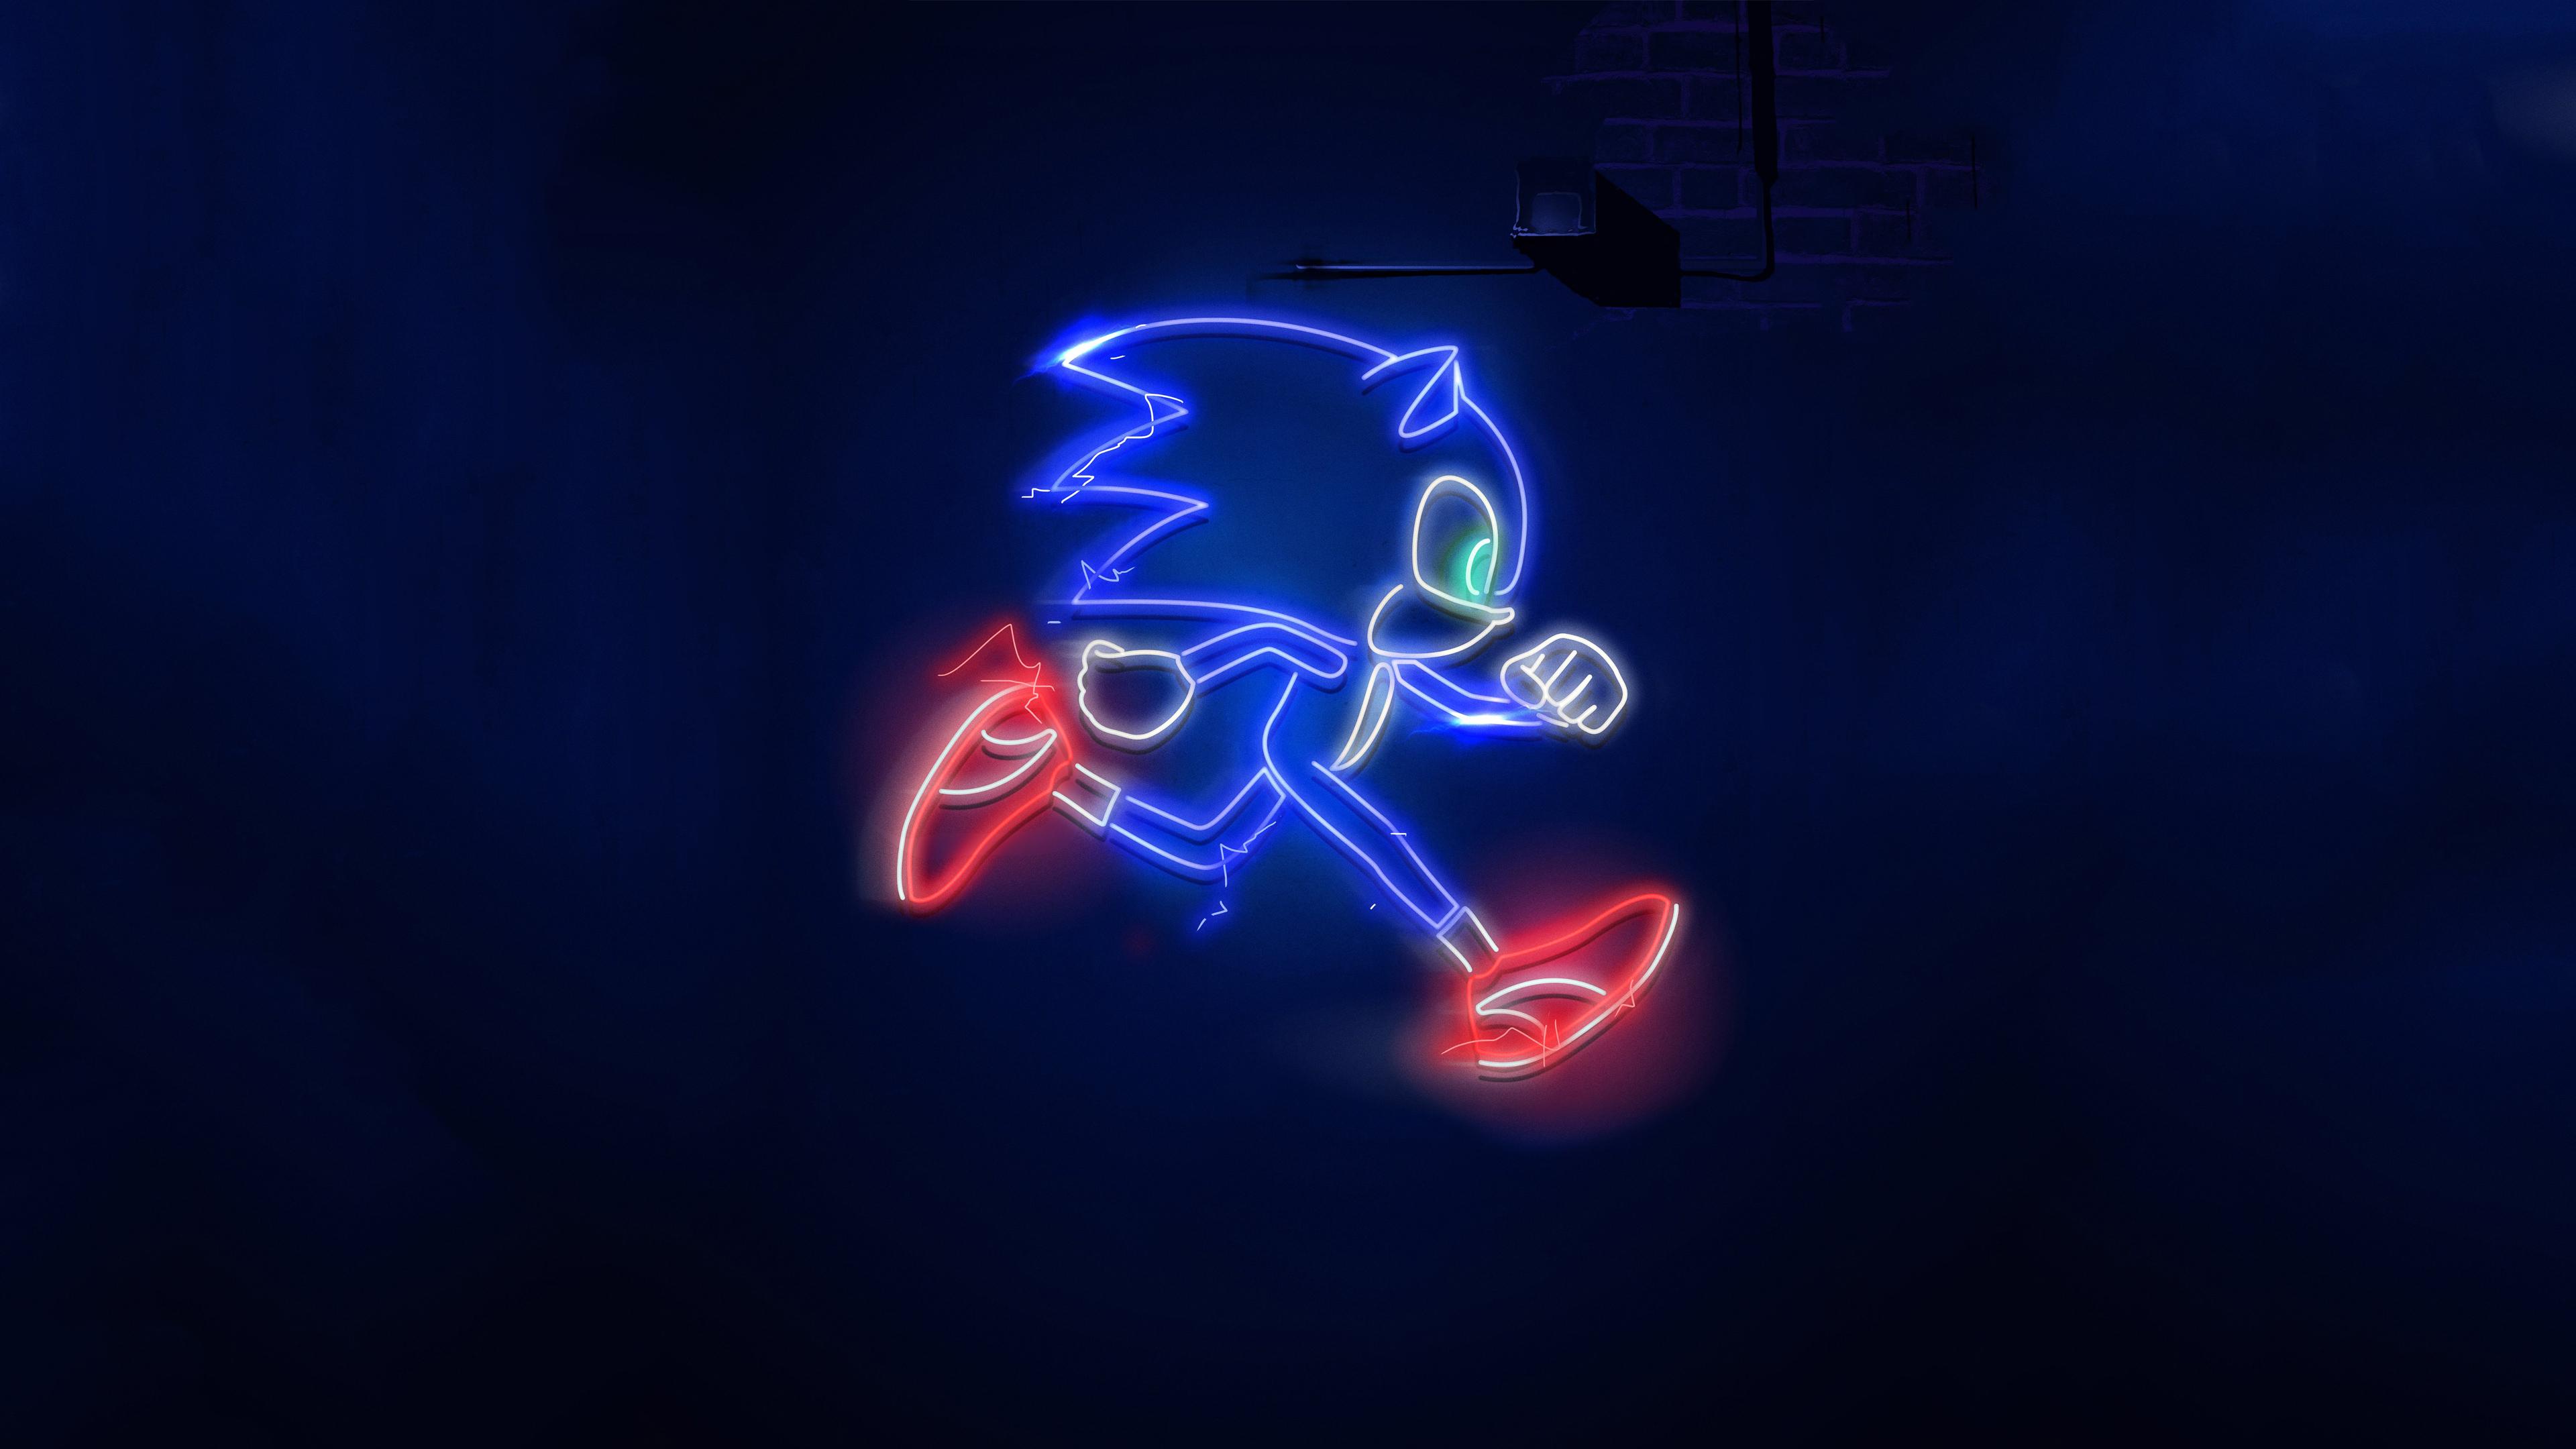 Wallpaper 4k Sonic The Hedgehog Movie 2020 sonic 4k wallpapers 3840x2160